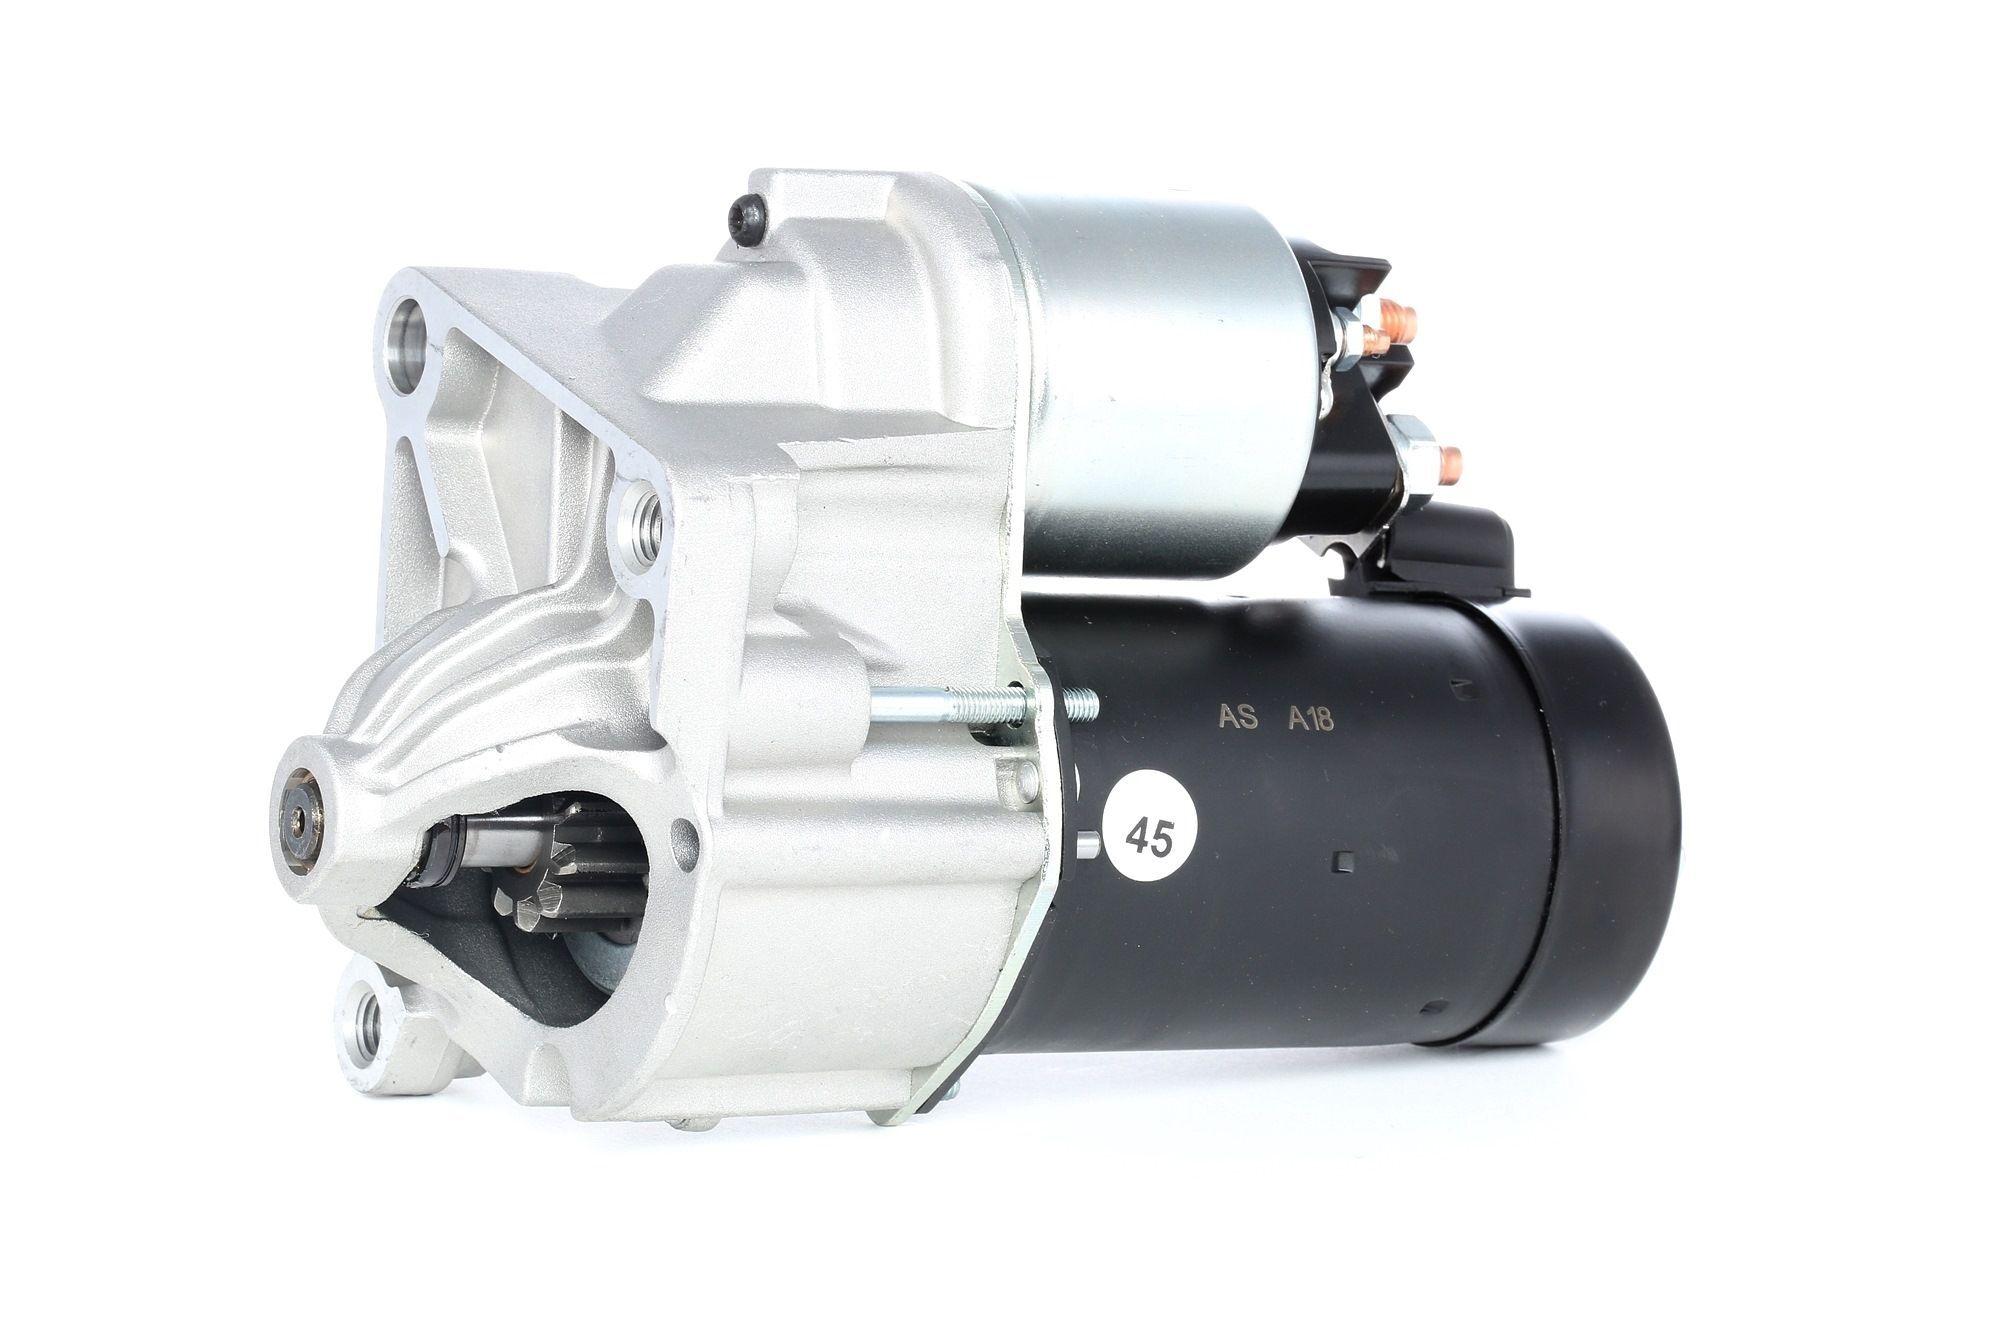 AS-PL Starttimoottori Brand new AS-PL Alternator rectifier S3052 Startti,Käynnistinmoottori OPEL,RENAULT,MAZDA,ARENA Bus,ARENA Kasten TB, TF